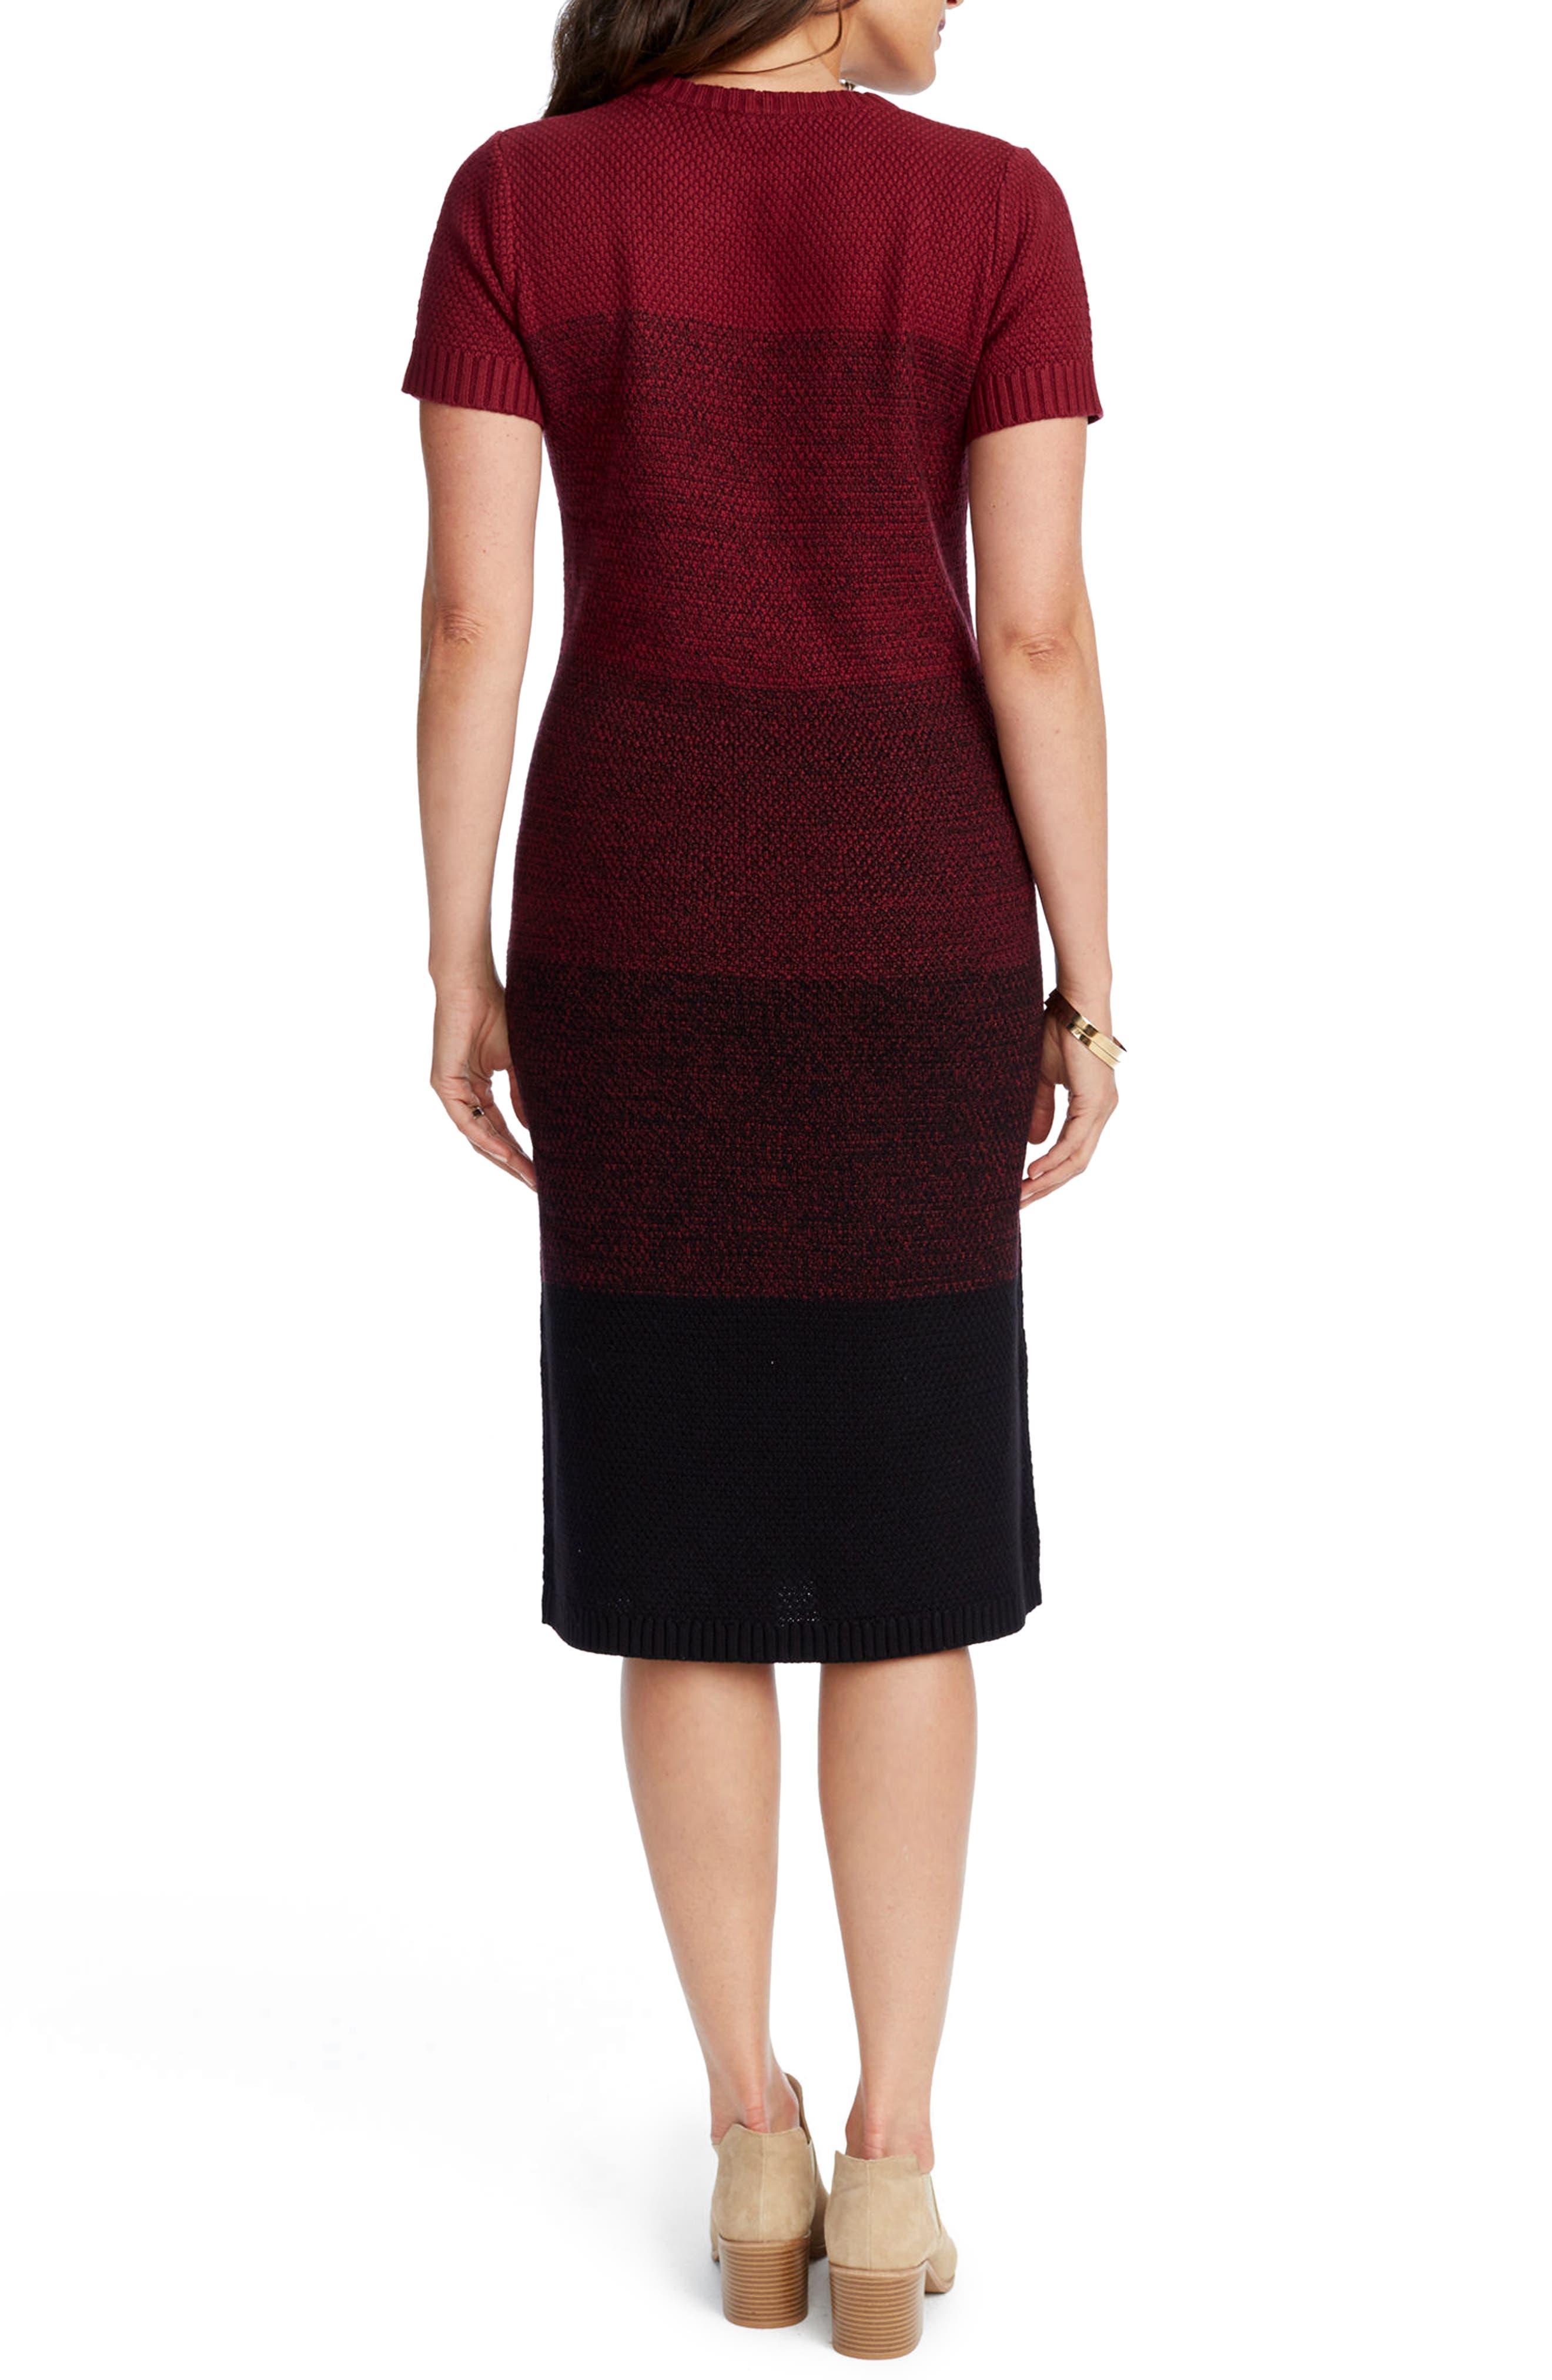 Daisy Ombré Maternity T-Shirt Dress,                             Alternate thumbnail 2, color,                             BURGUNDY OMBRE